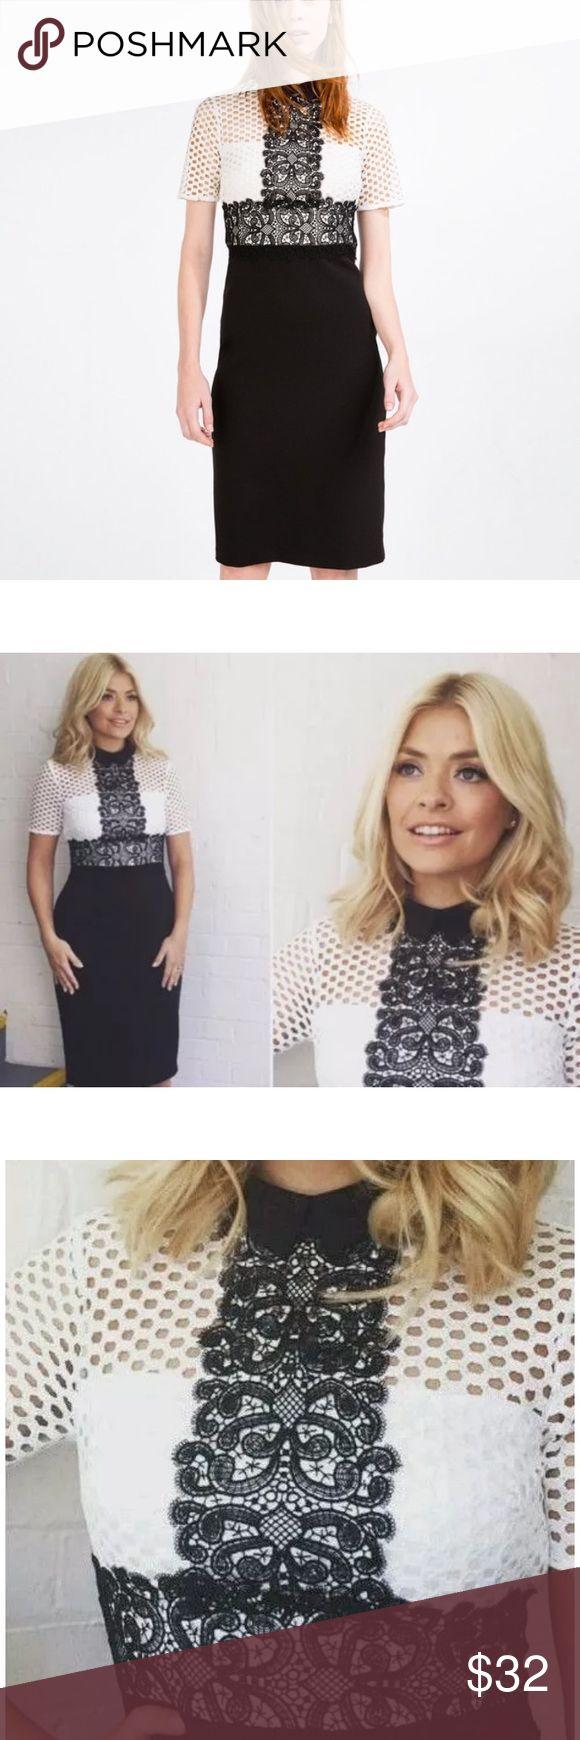 1000  ideas about Tube Dress on Pinterest - Black bodycon dress ...